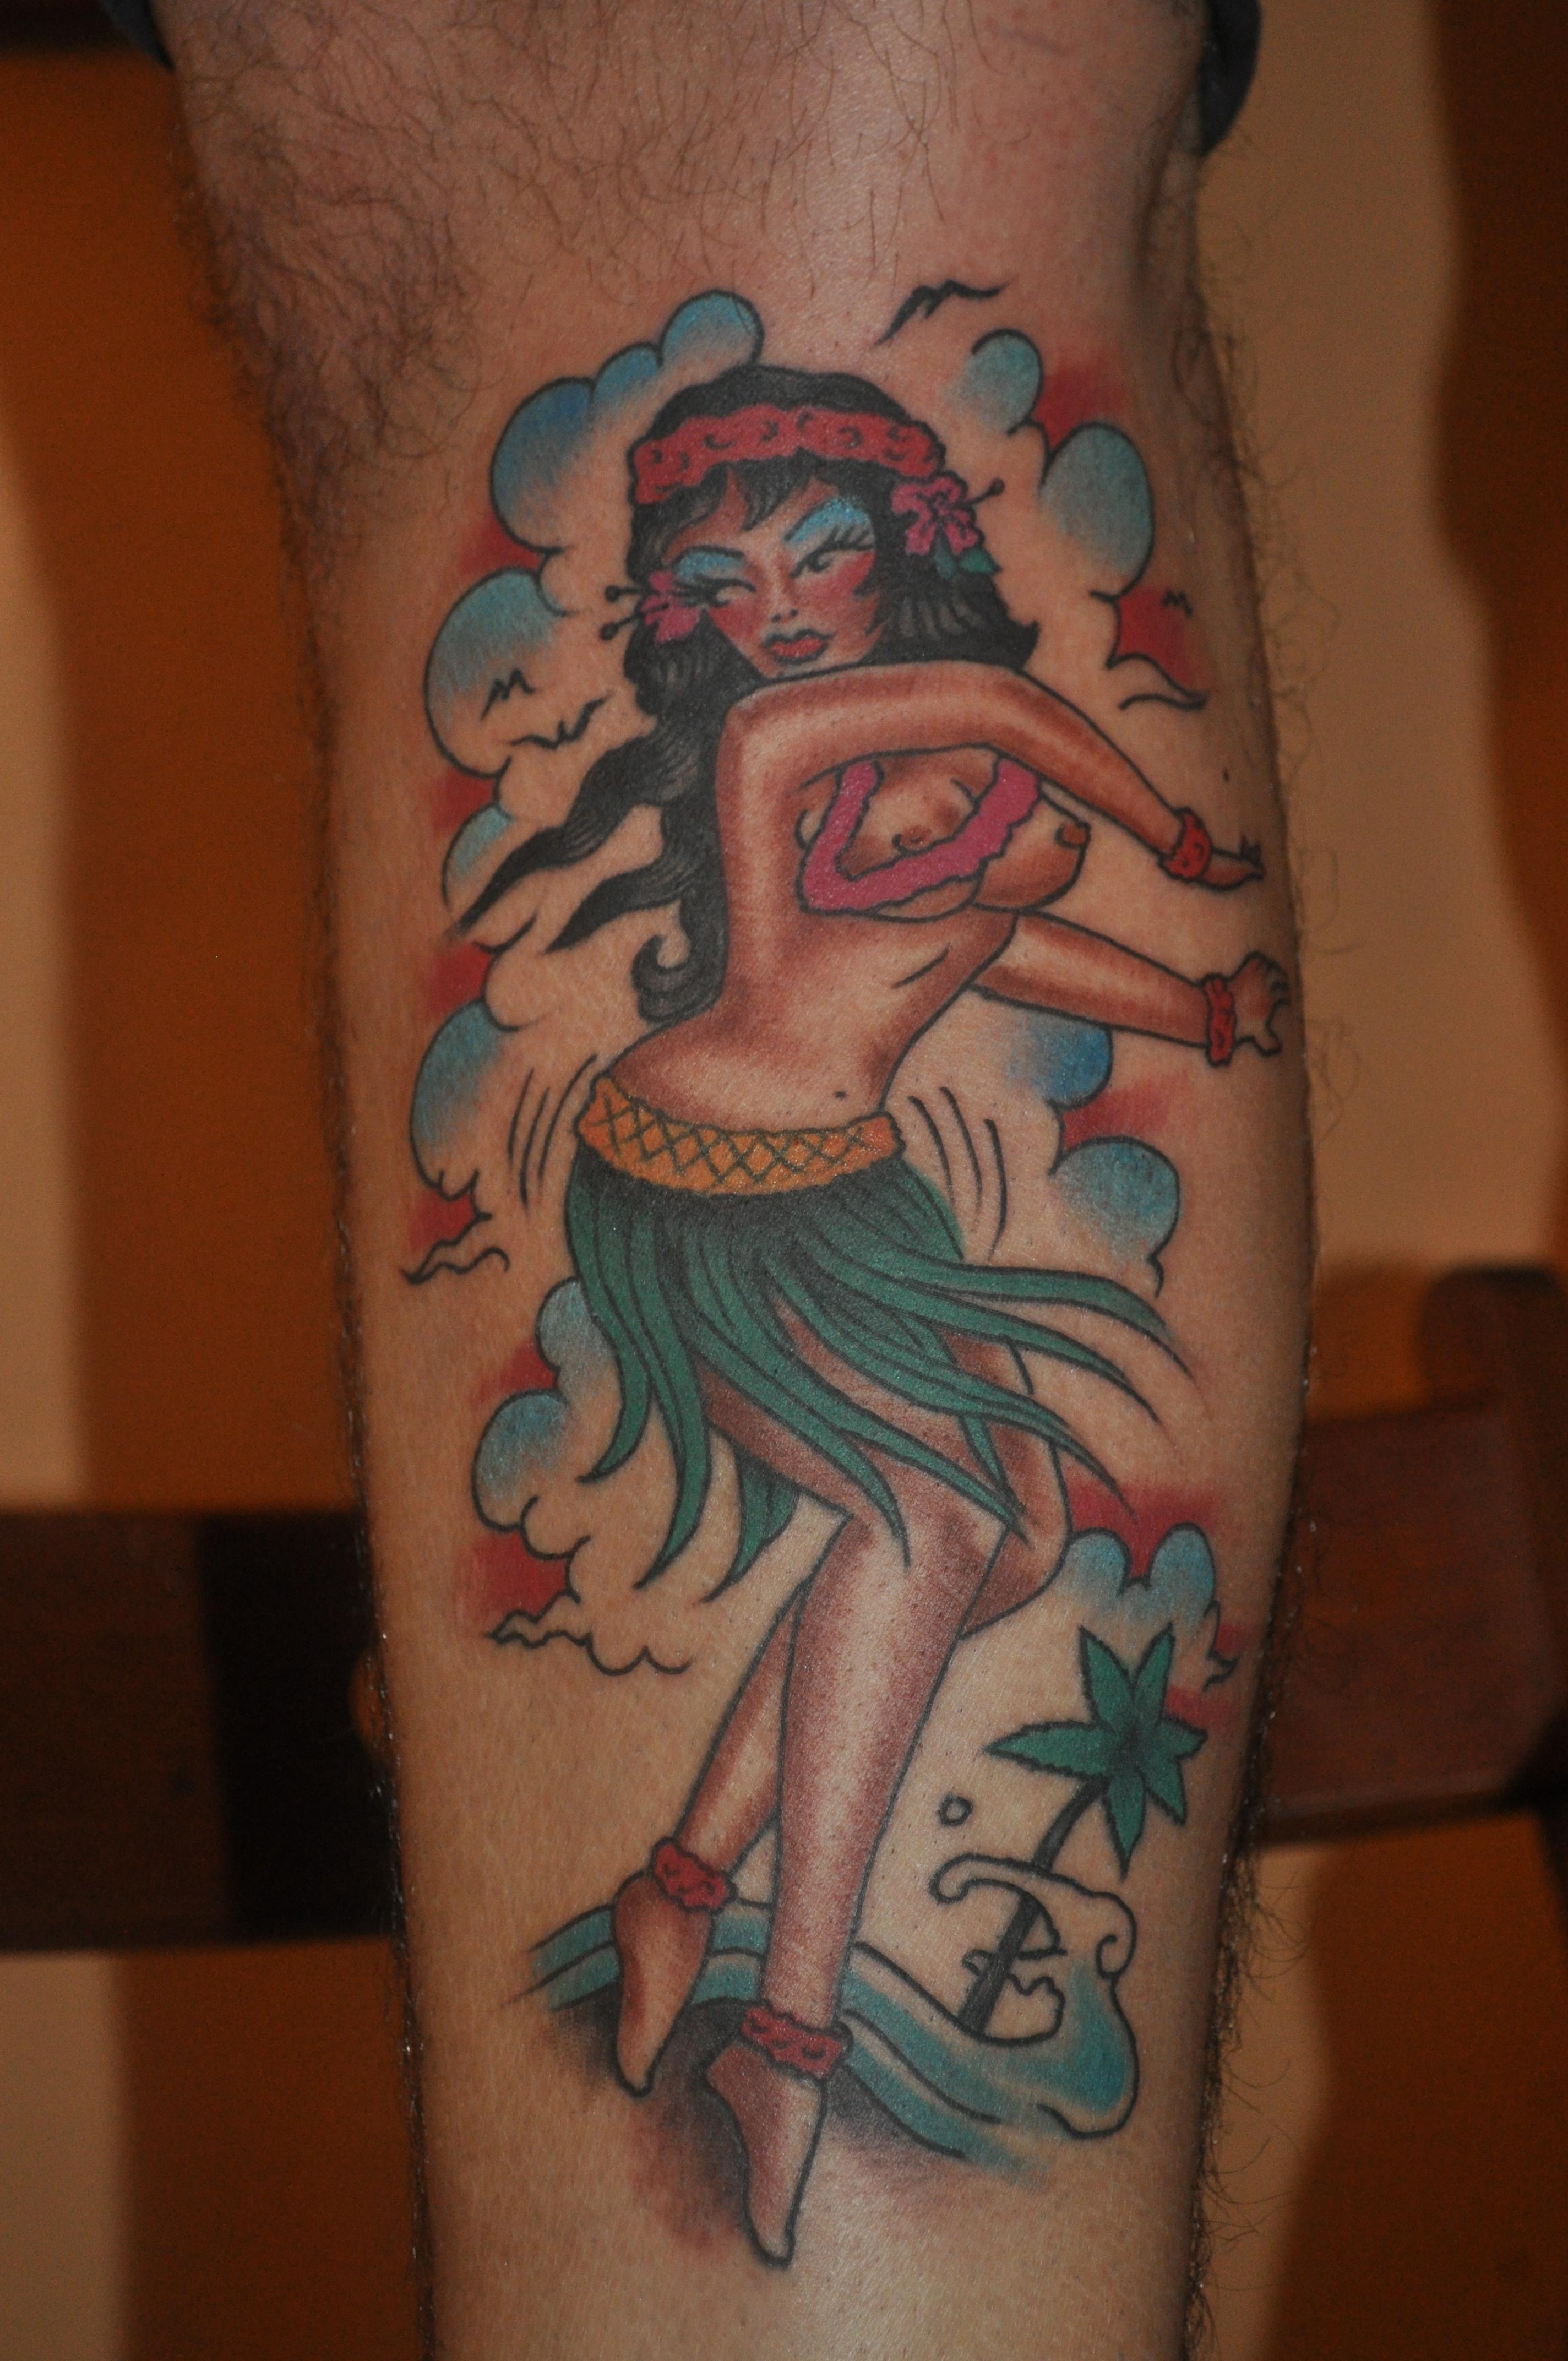 Rose Tattoo Amsterdam, Bill Loika,Traditional American, Old School tattoo, Color tattoo, Traditional Western, Americana, Pin-up tattoo, Amsterdam tattoo shop